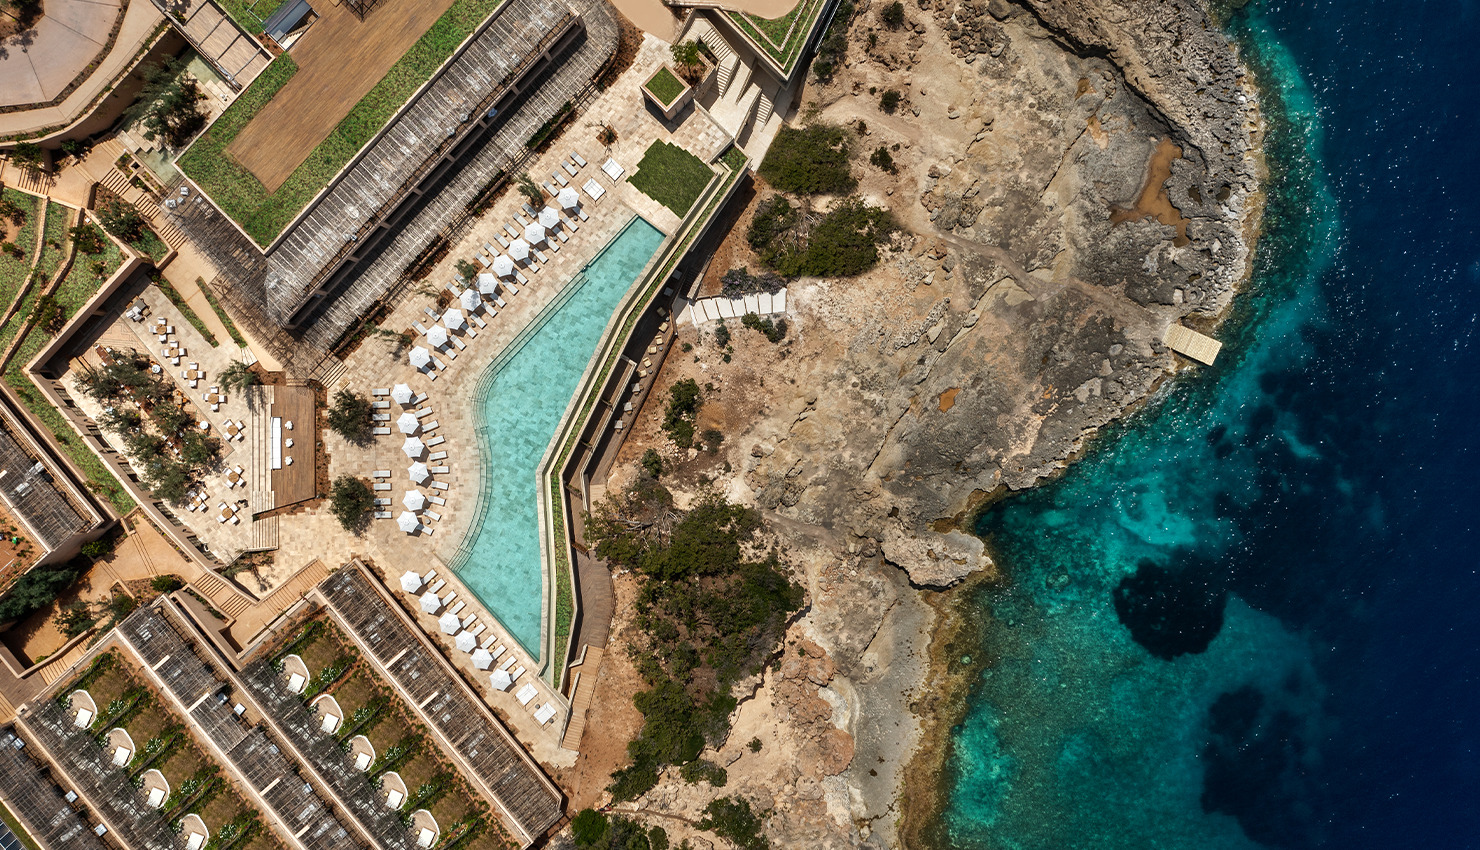 ibiza-hoteles-bienestar-sostenibles-magazinehorse